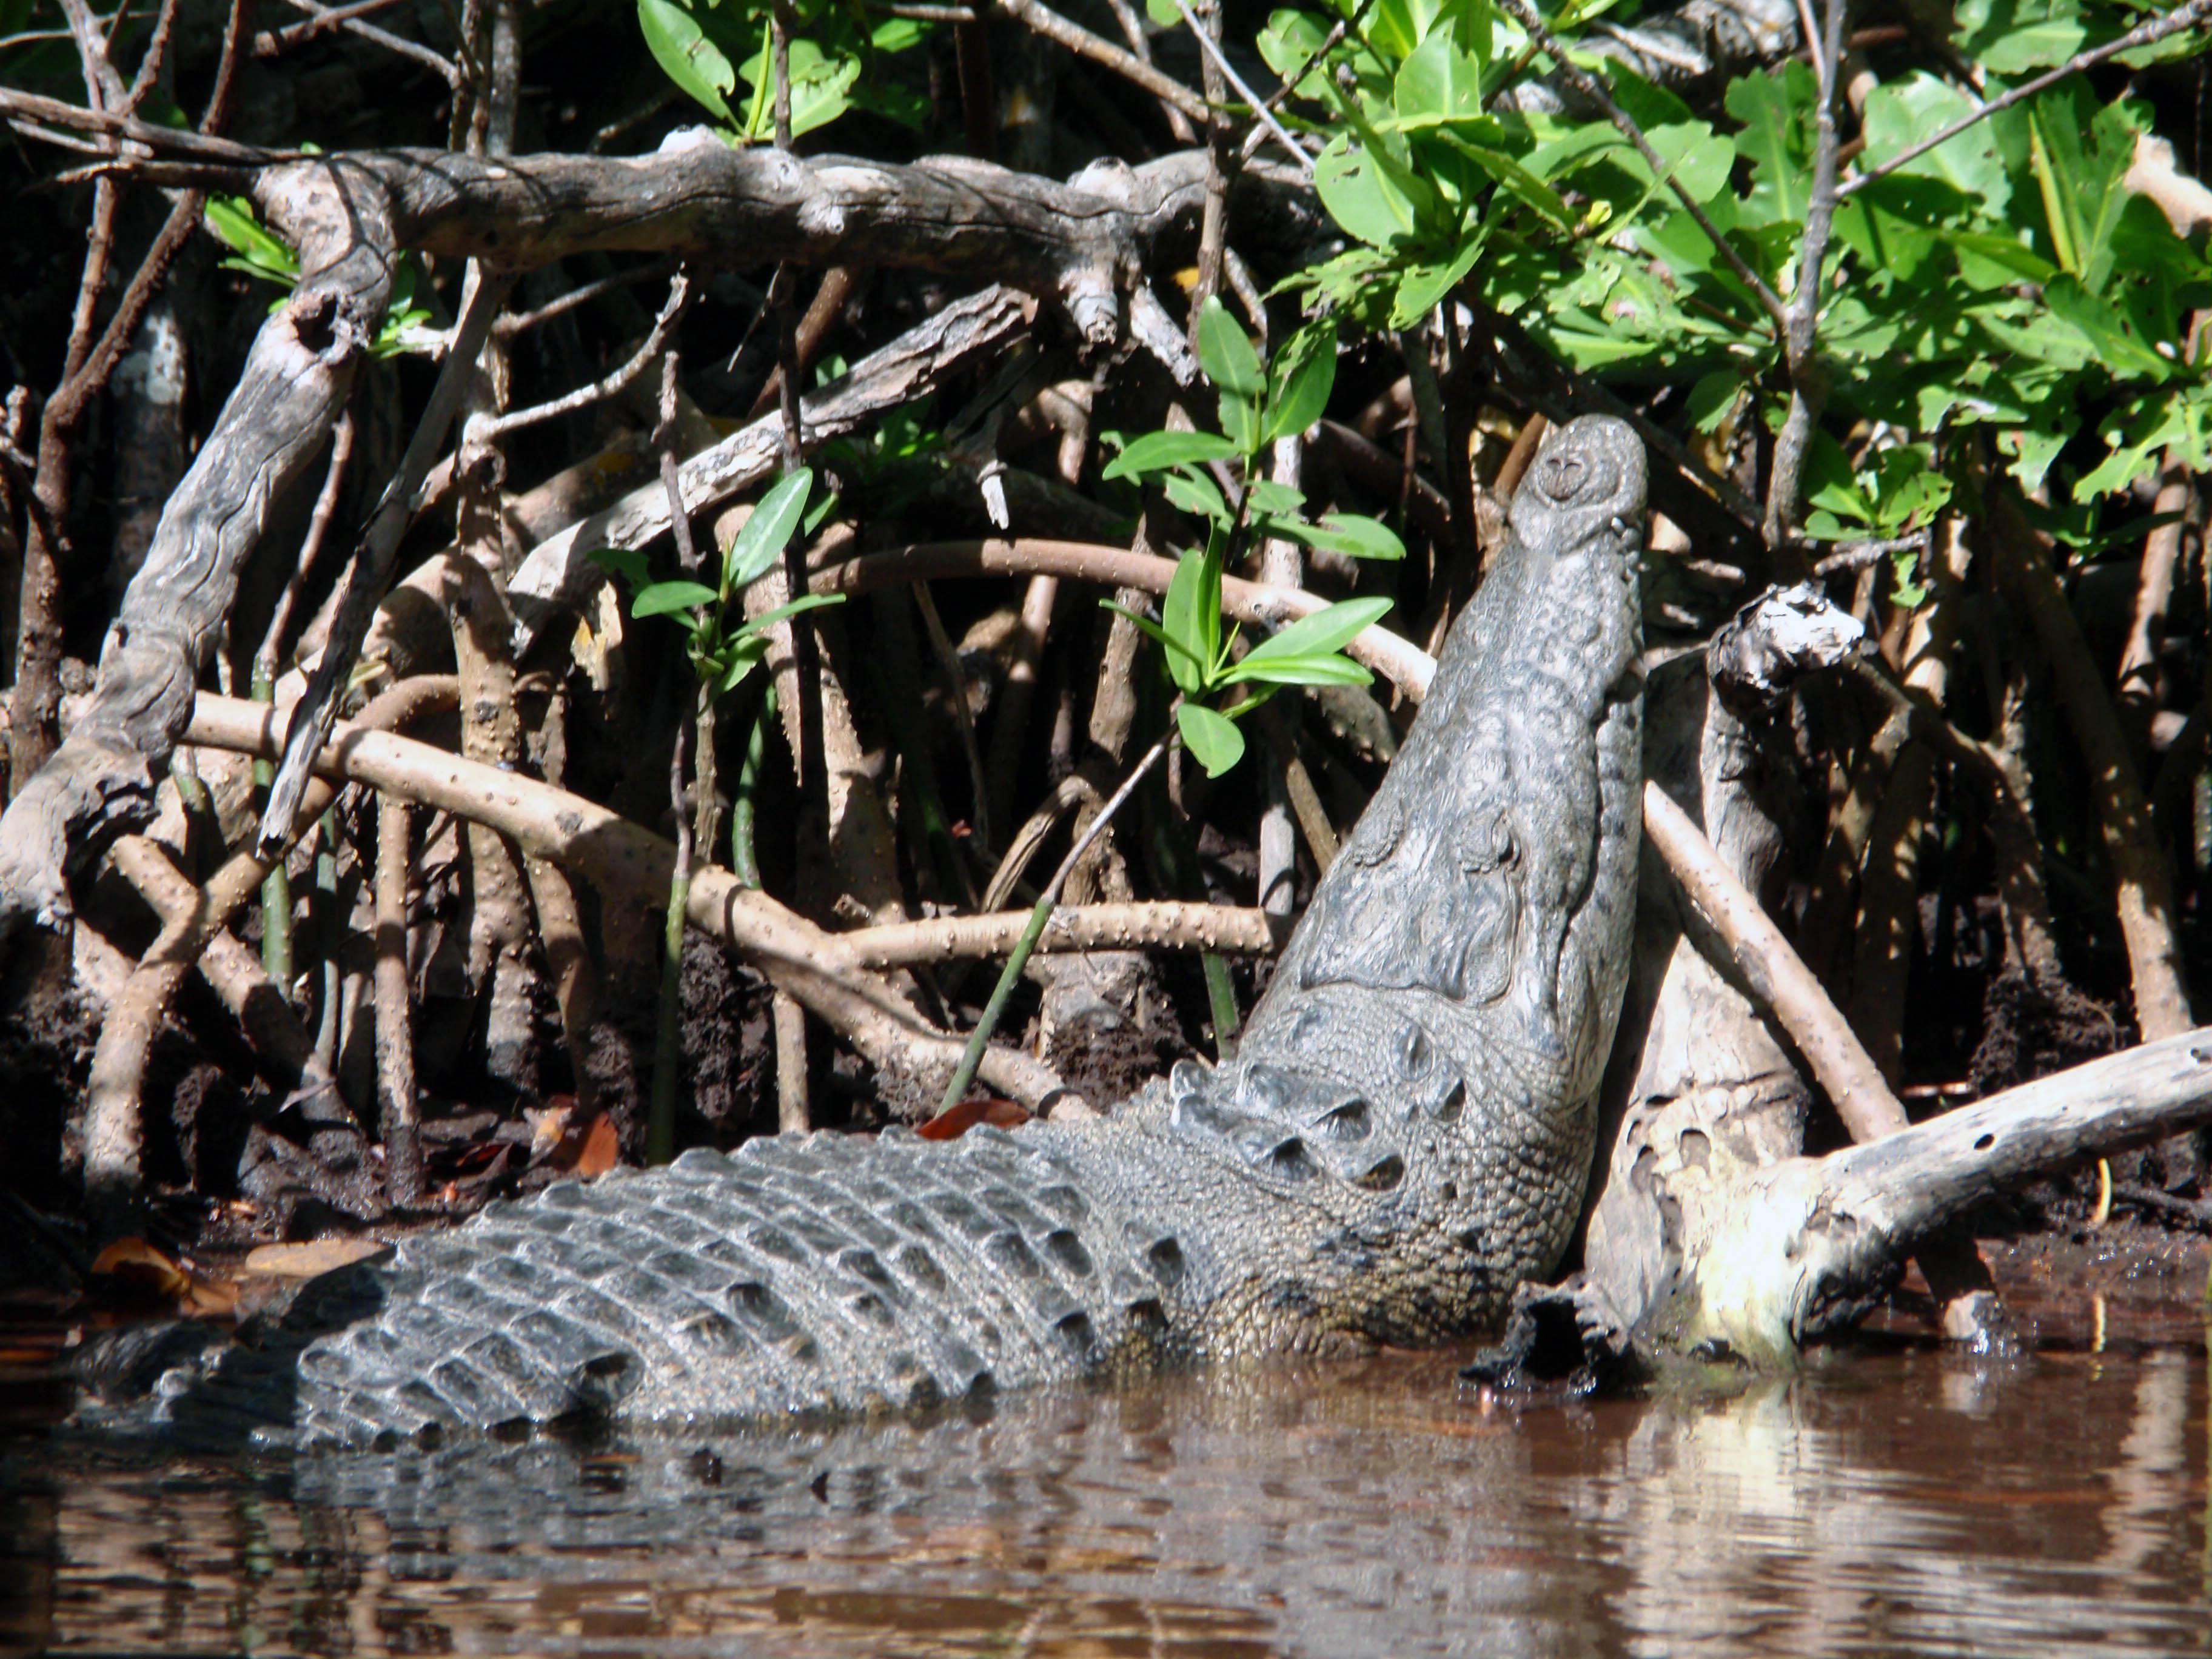 Crocodile Sian Kaan Biosphere